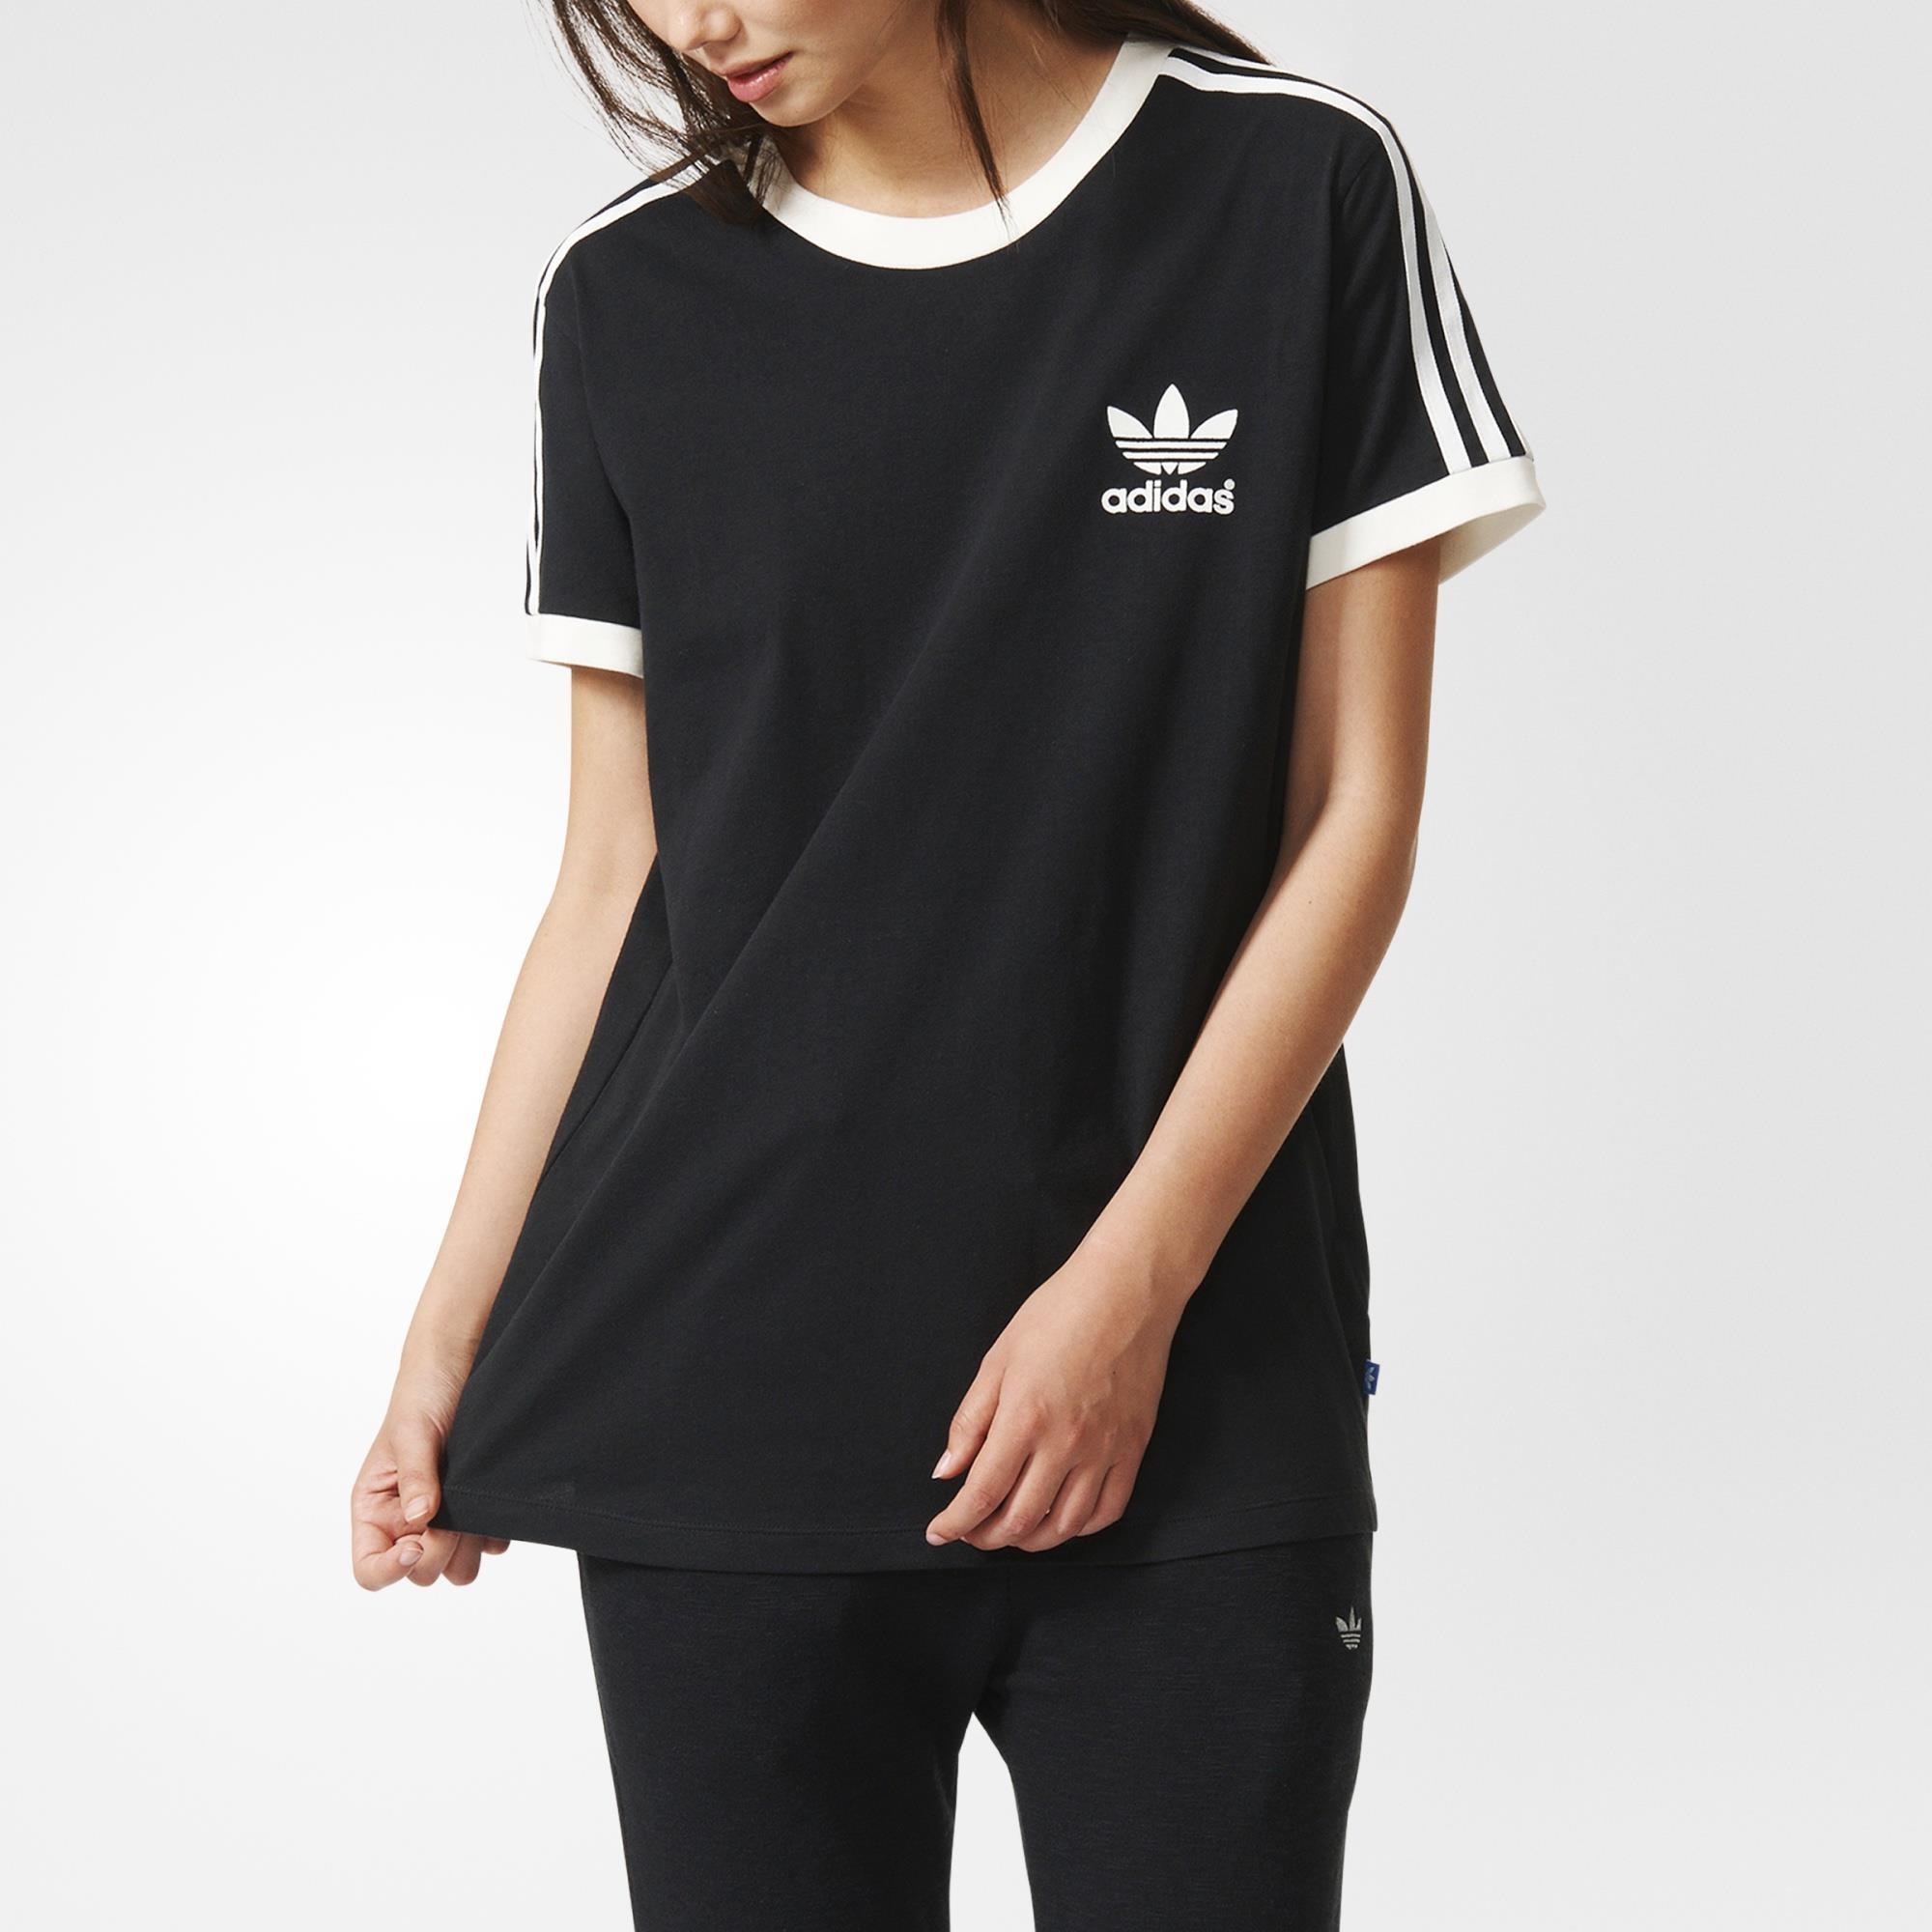 08d81456d5 adidas 3-Stripes Tee - Black